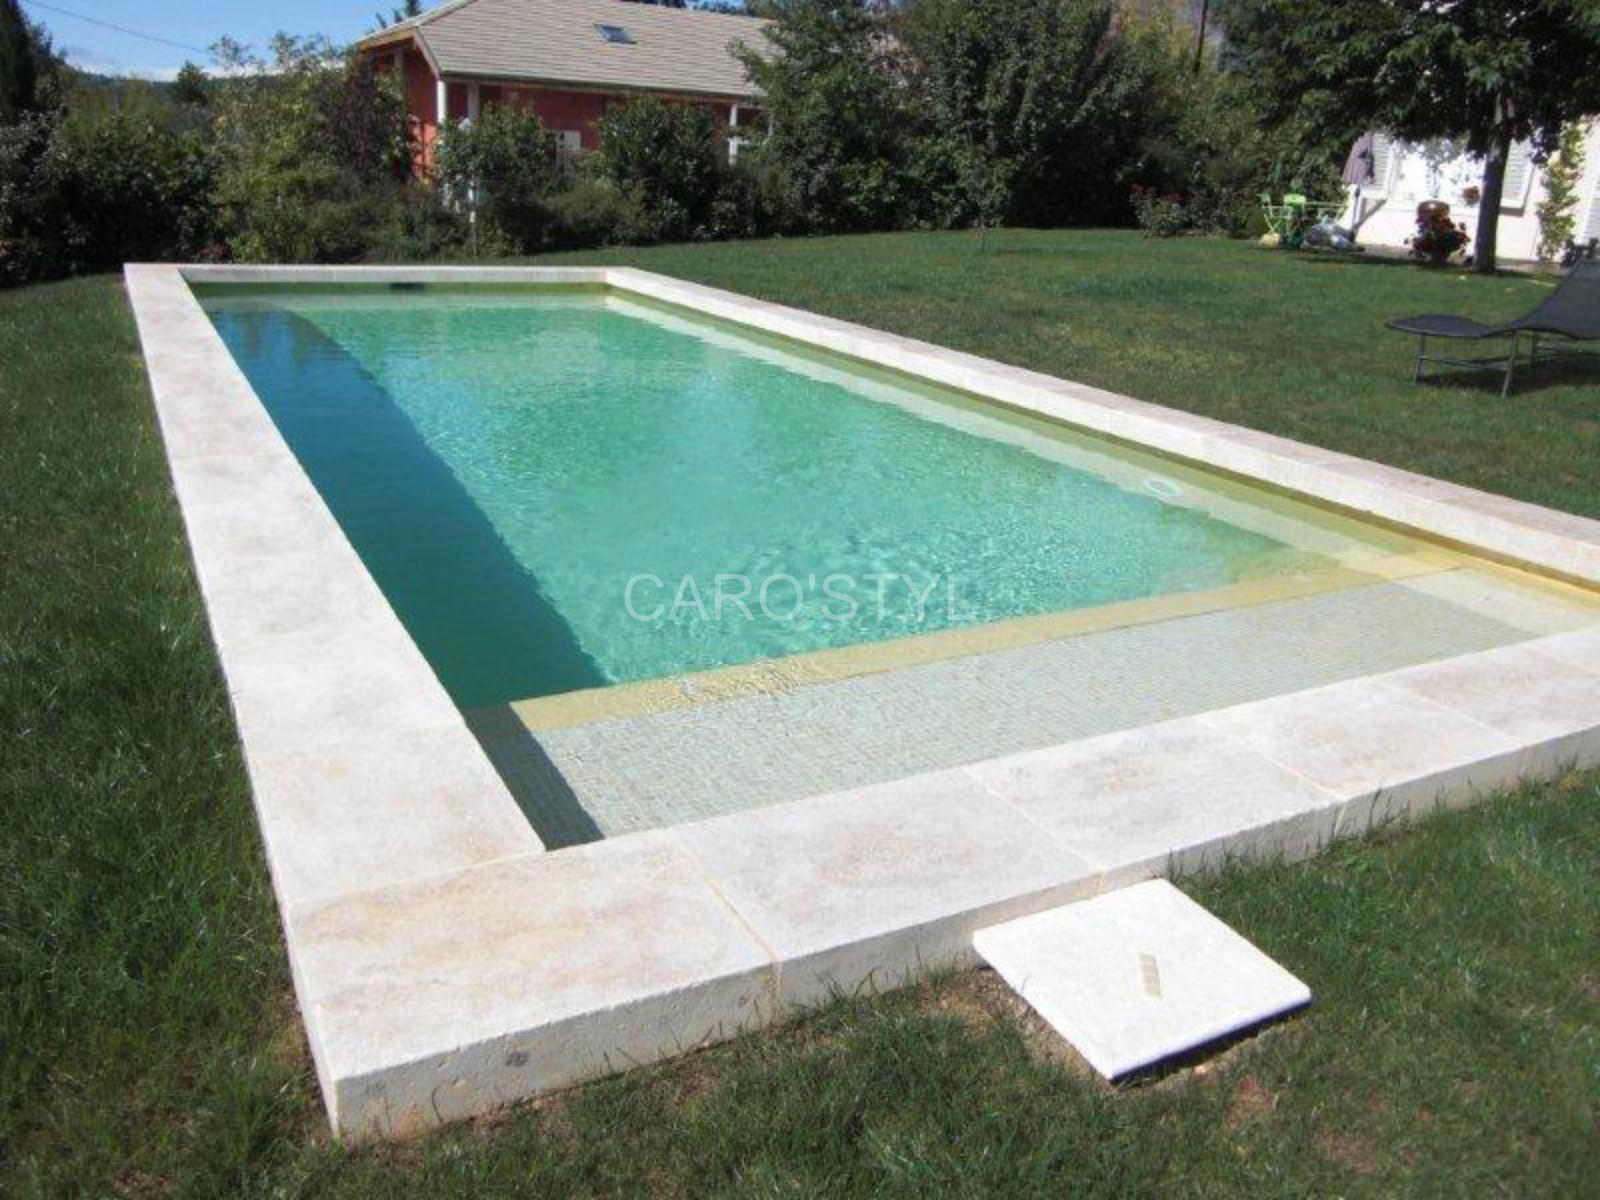 Margelle de piscine en travertin Magasin de carrelage